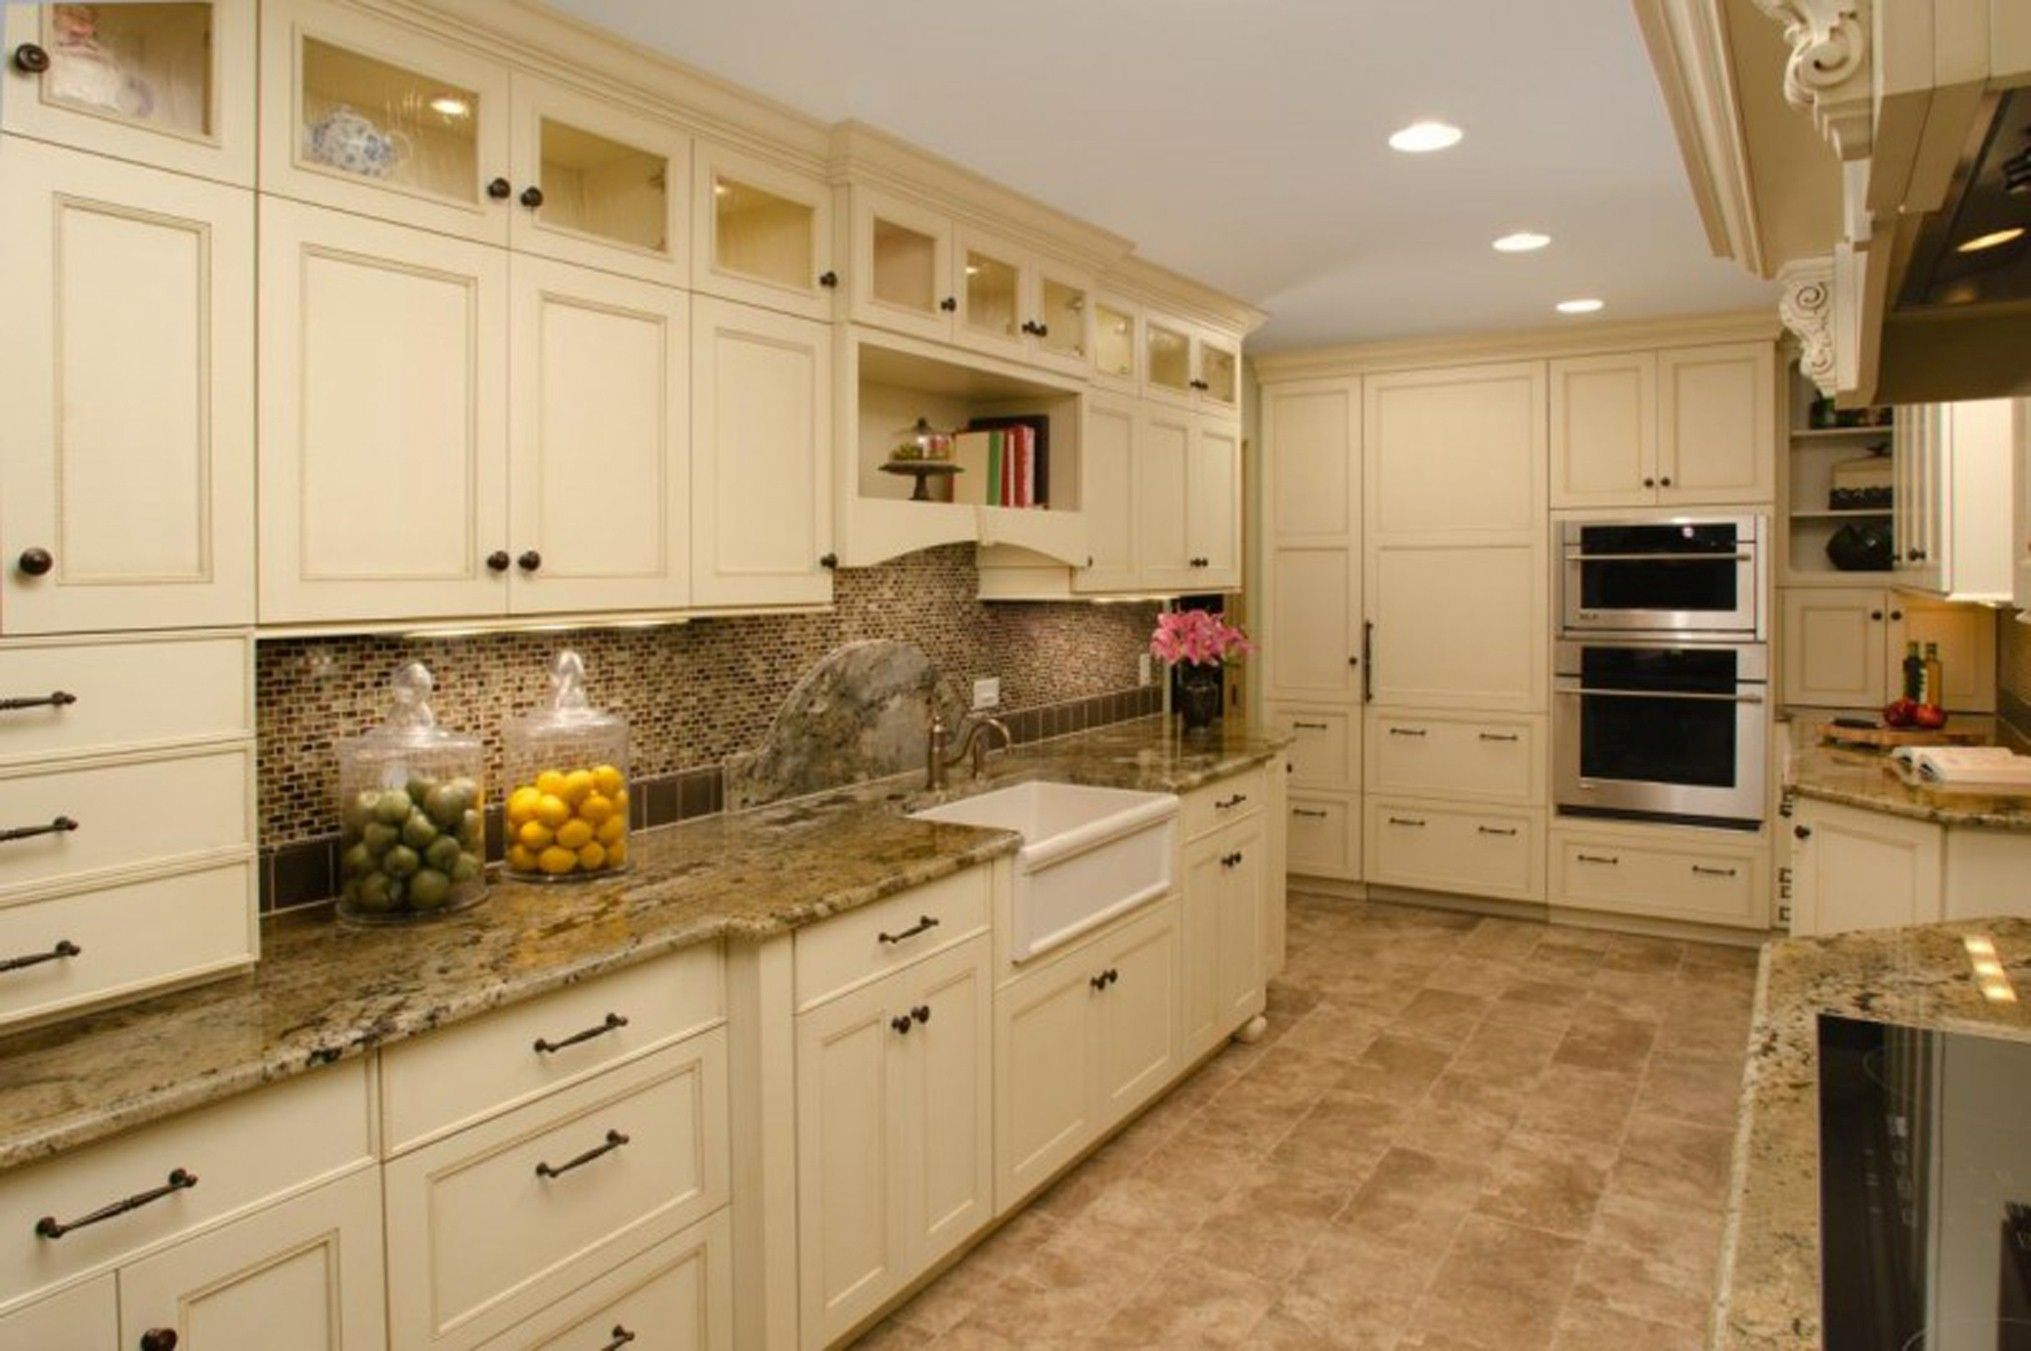 Cream Cabinet Galley Kitchen Off White Cabinets Subway ...